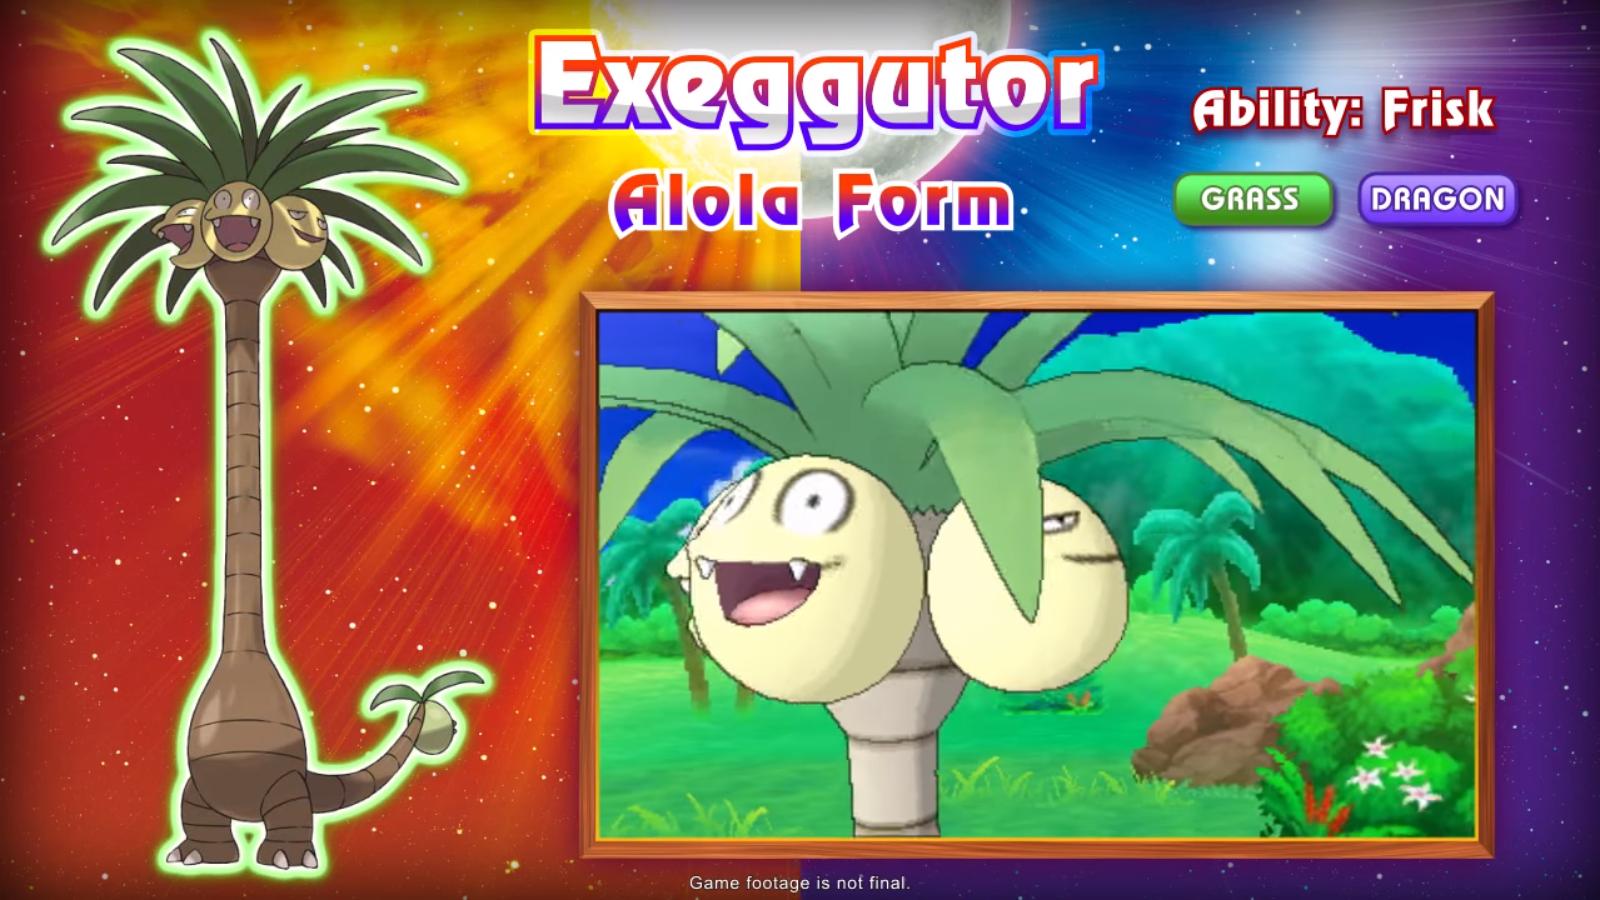 Grass/Dragon Exeggutor | Alola Exeggutor | Know Your Meme